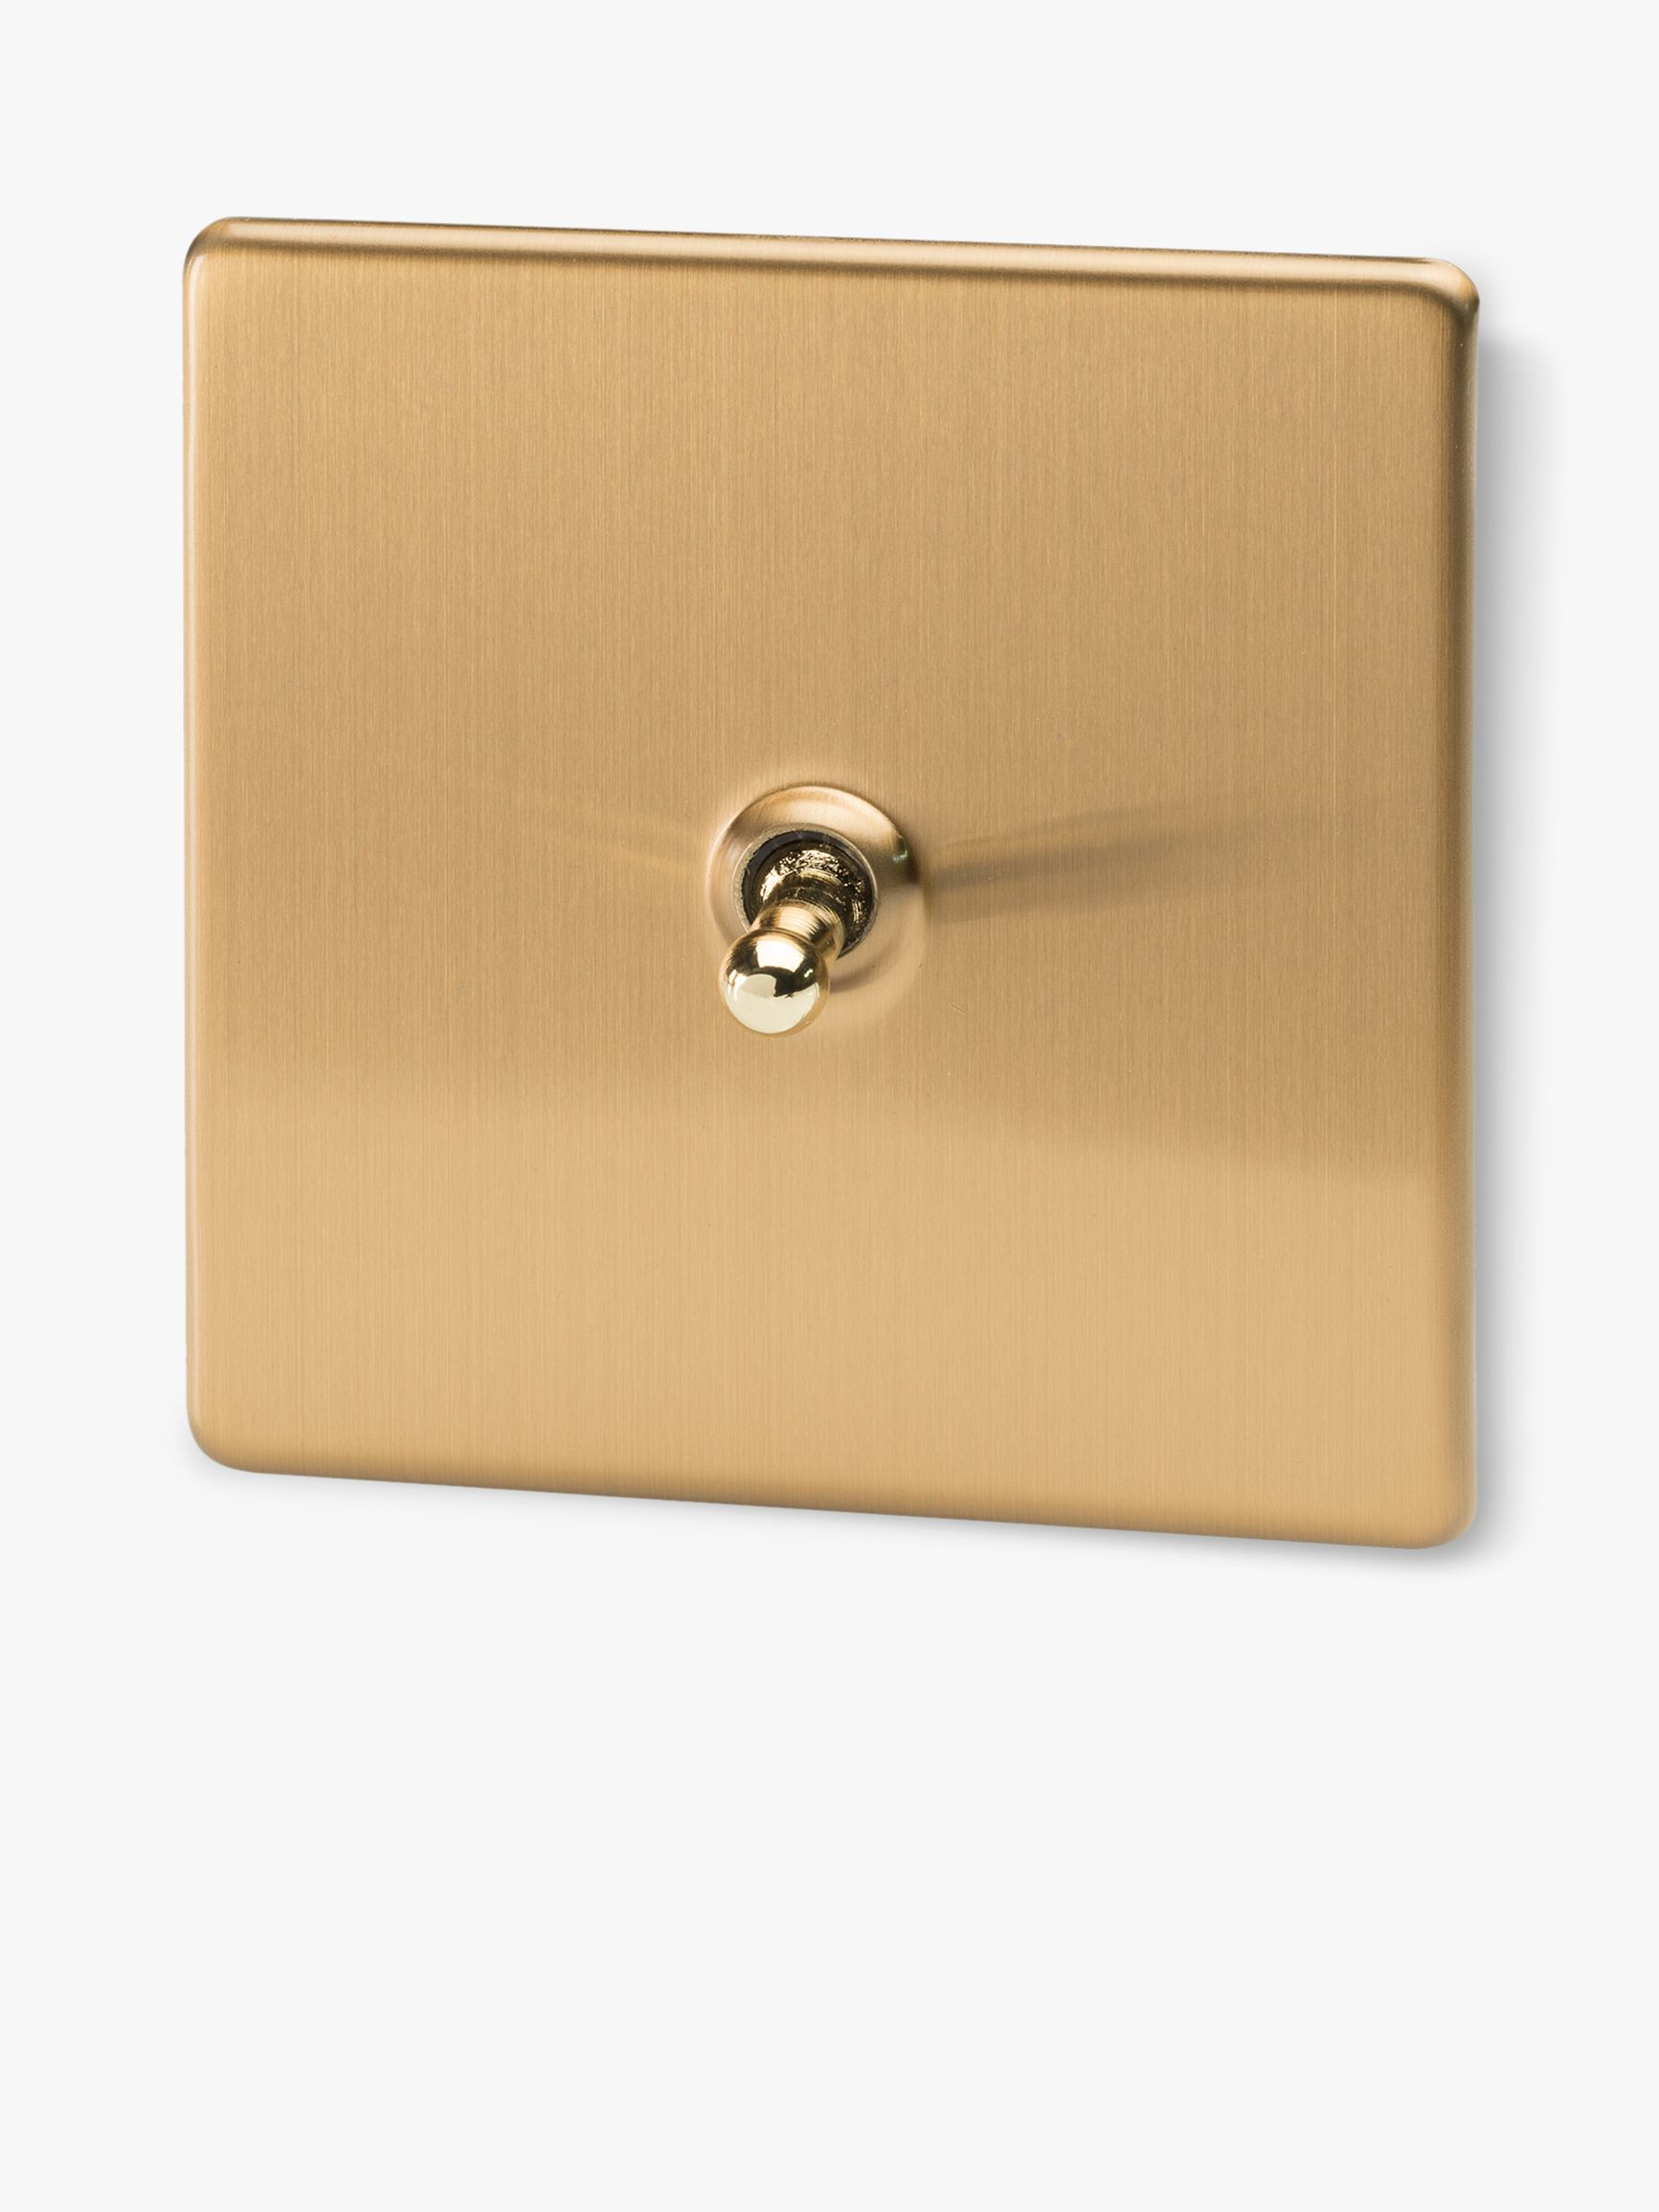 Varilight Varilight 1 Gang 2 Way Toggle Switch, Brushed Brass